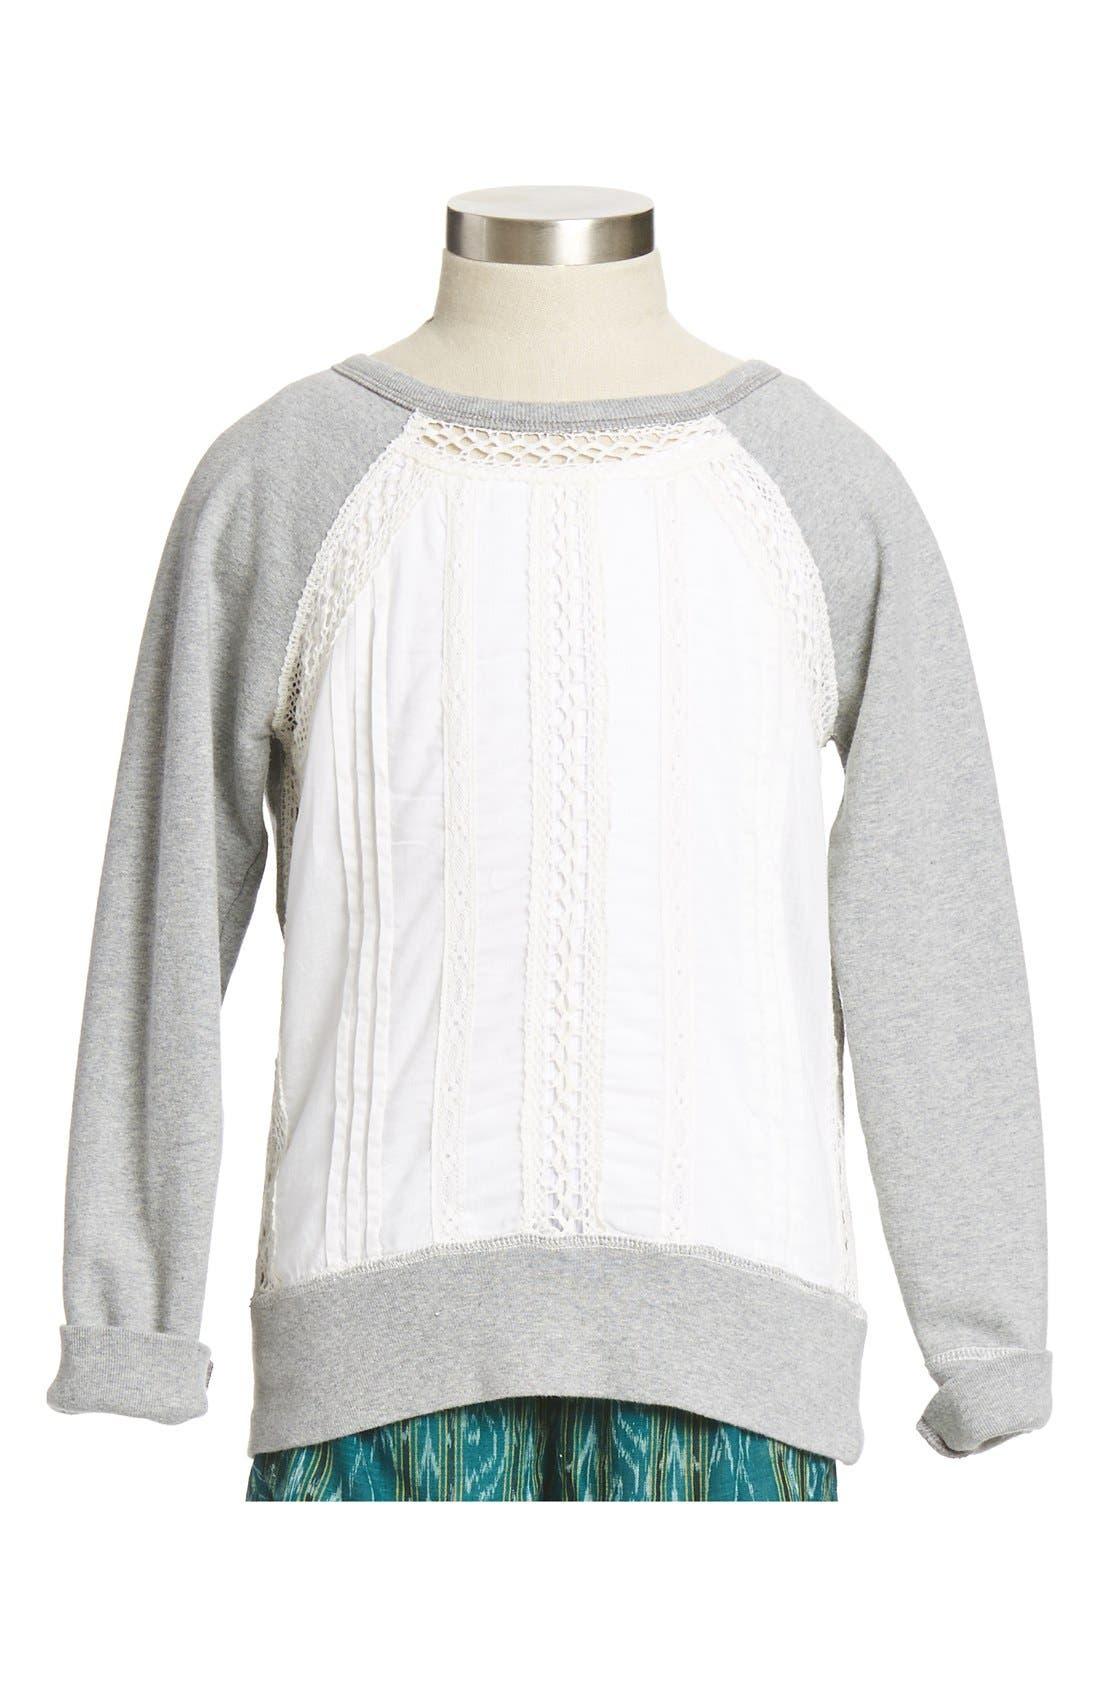 Main Image - Peek 'Sparrow' Woven Panel Crewneck Sweatshirt (Toddler Girls, Little Girls & Big Girls)